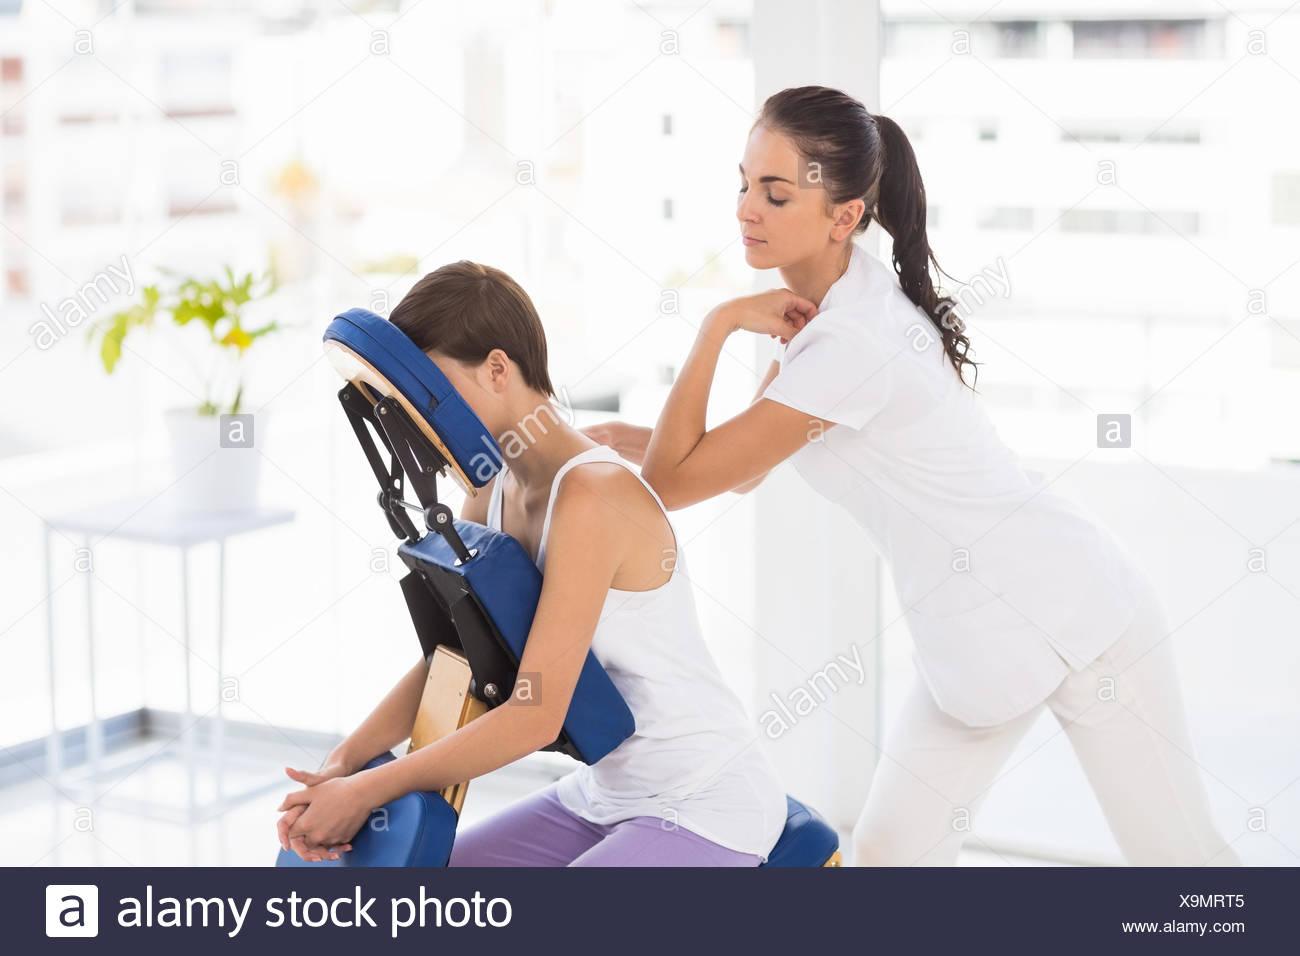 Masseuse giving back massage to woman - Stock Image